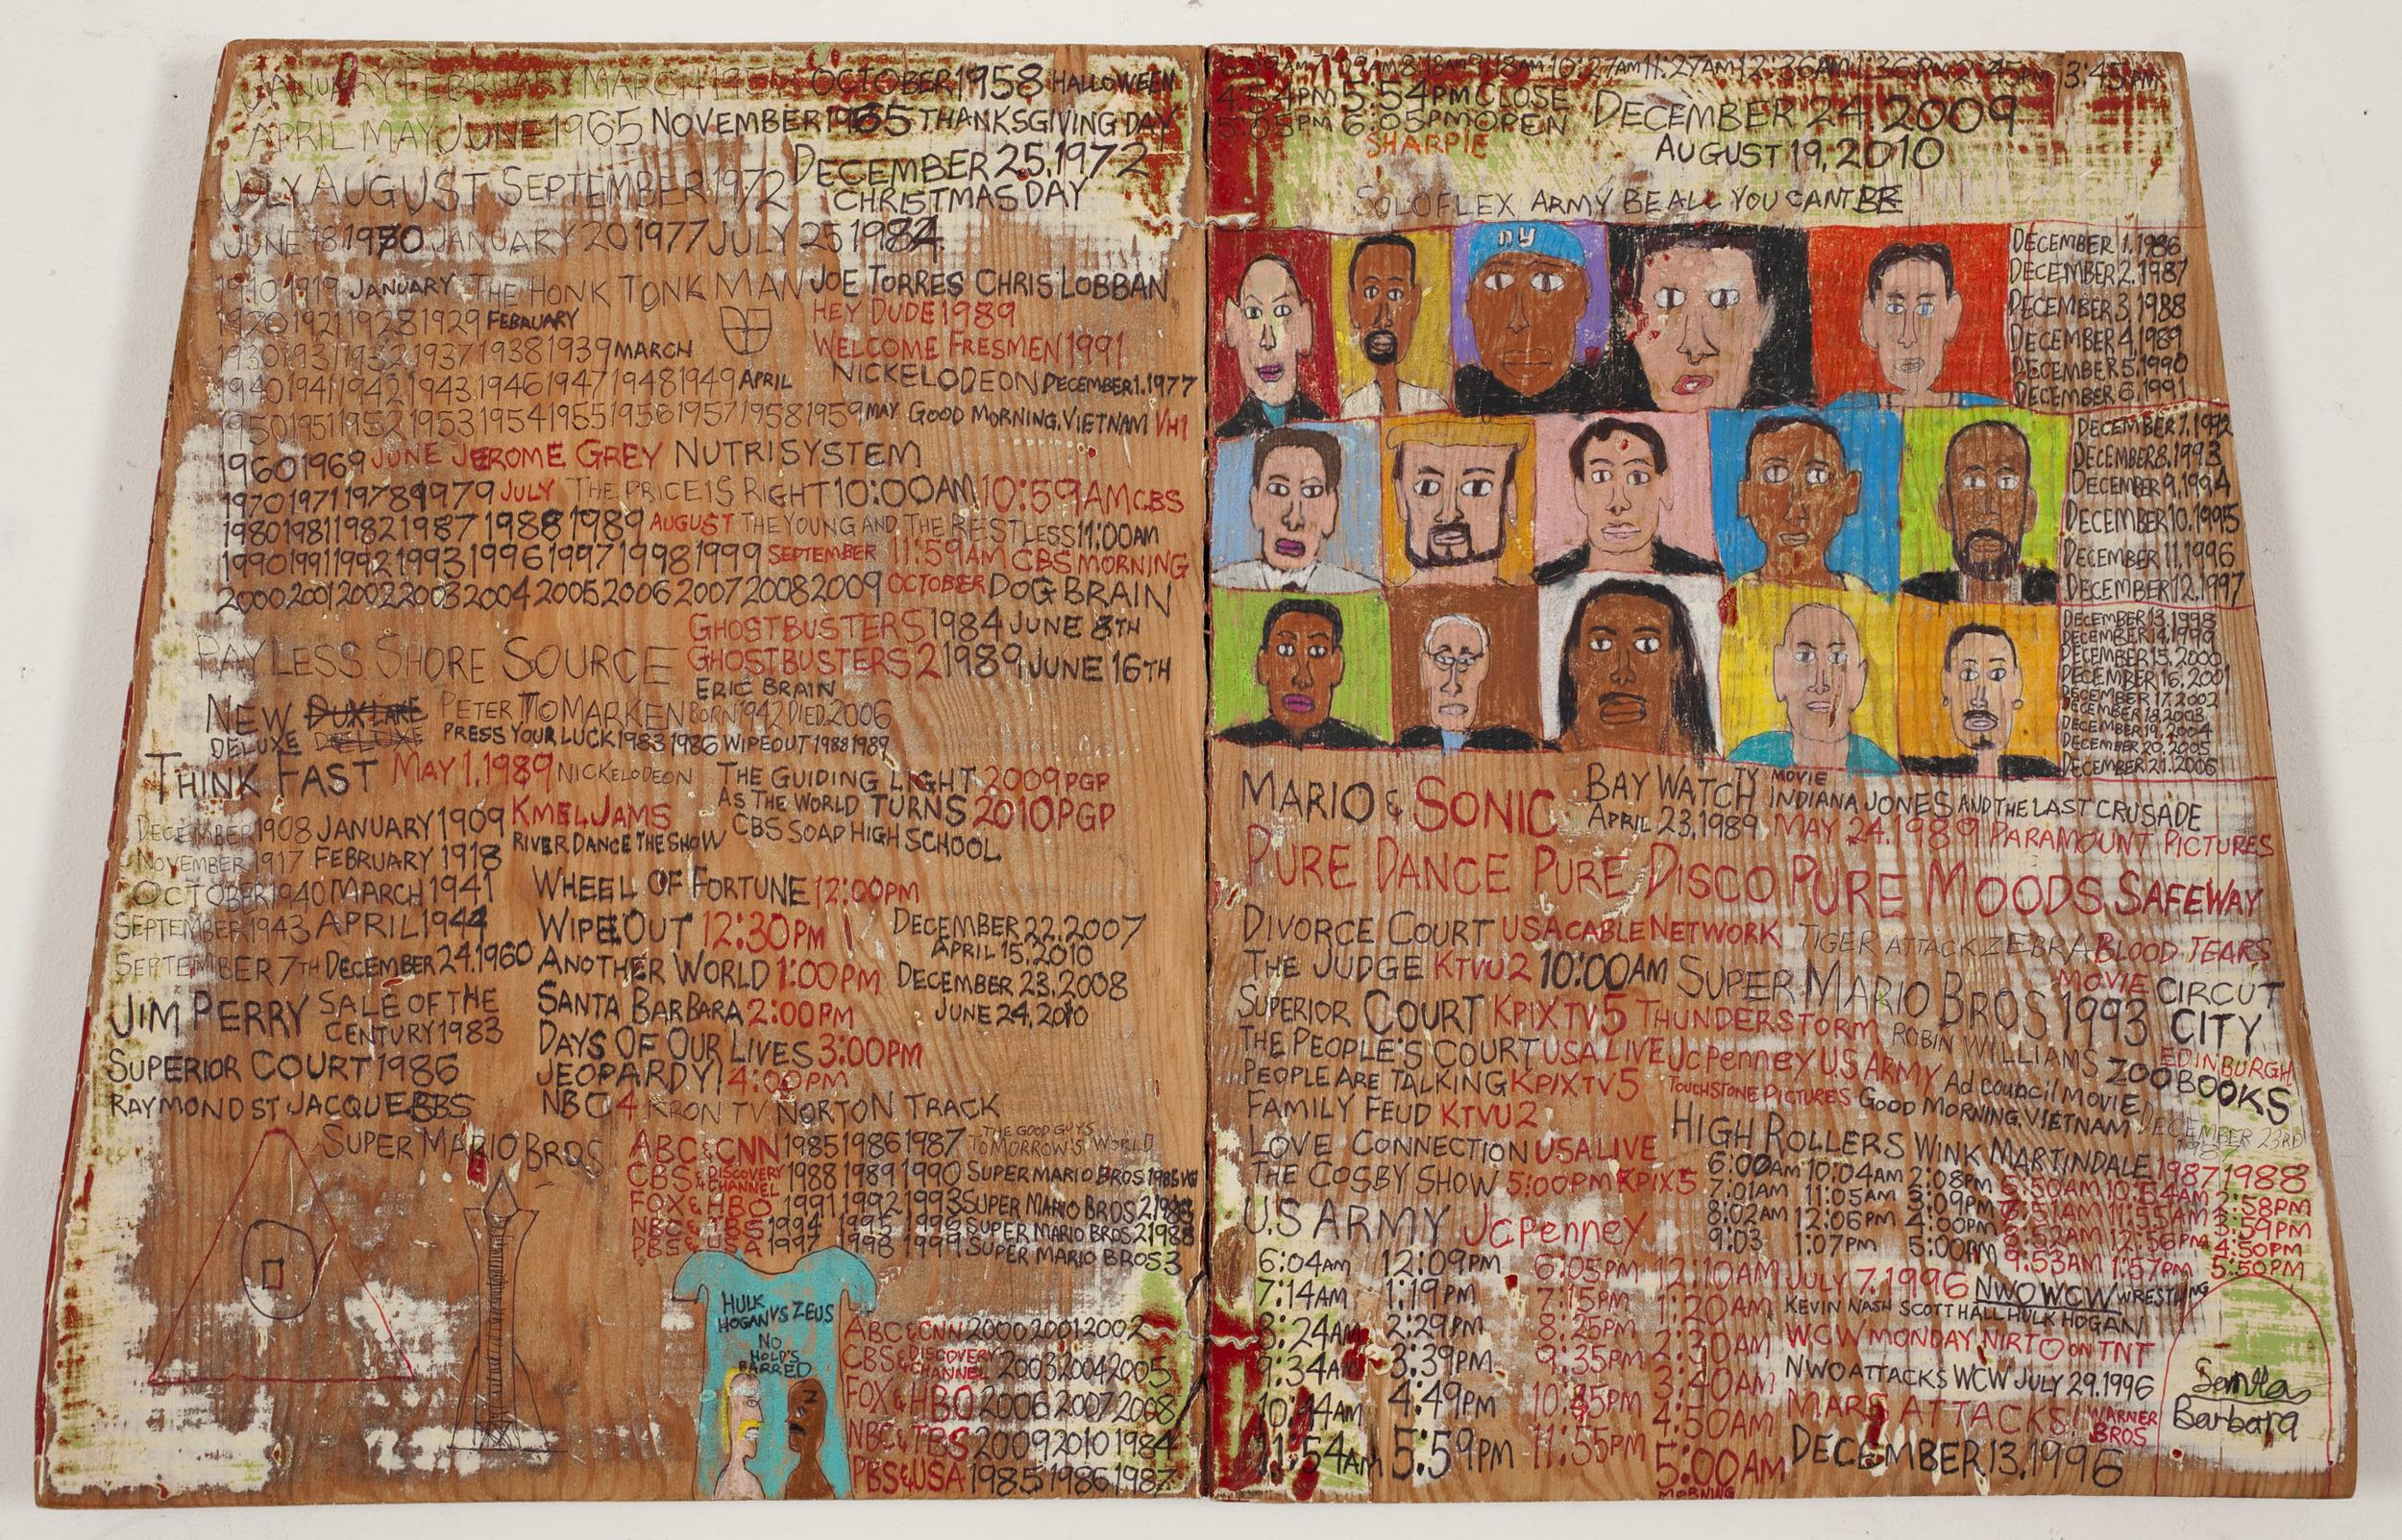 Daniel Green,  Fifteen People , 2009, Mixed media on wood, 14.25 x 22.5 x 1.75 inches